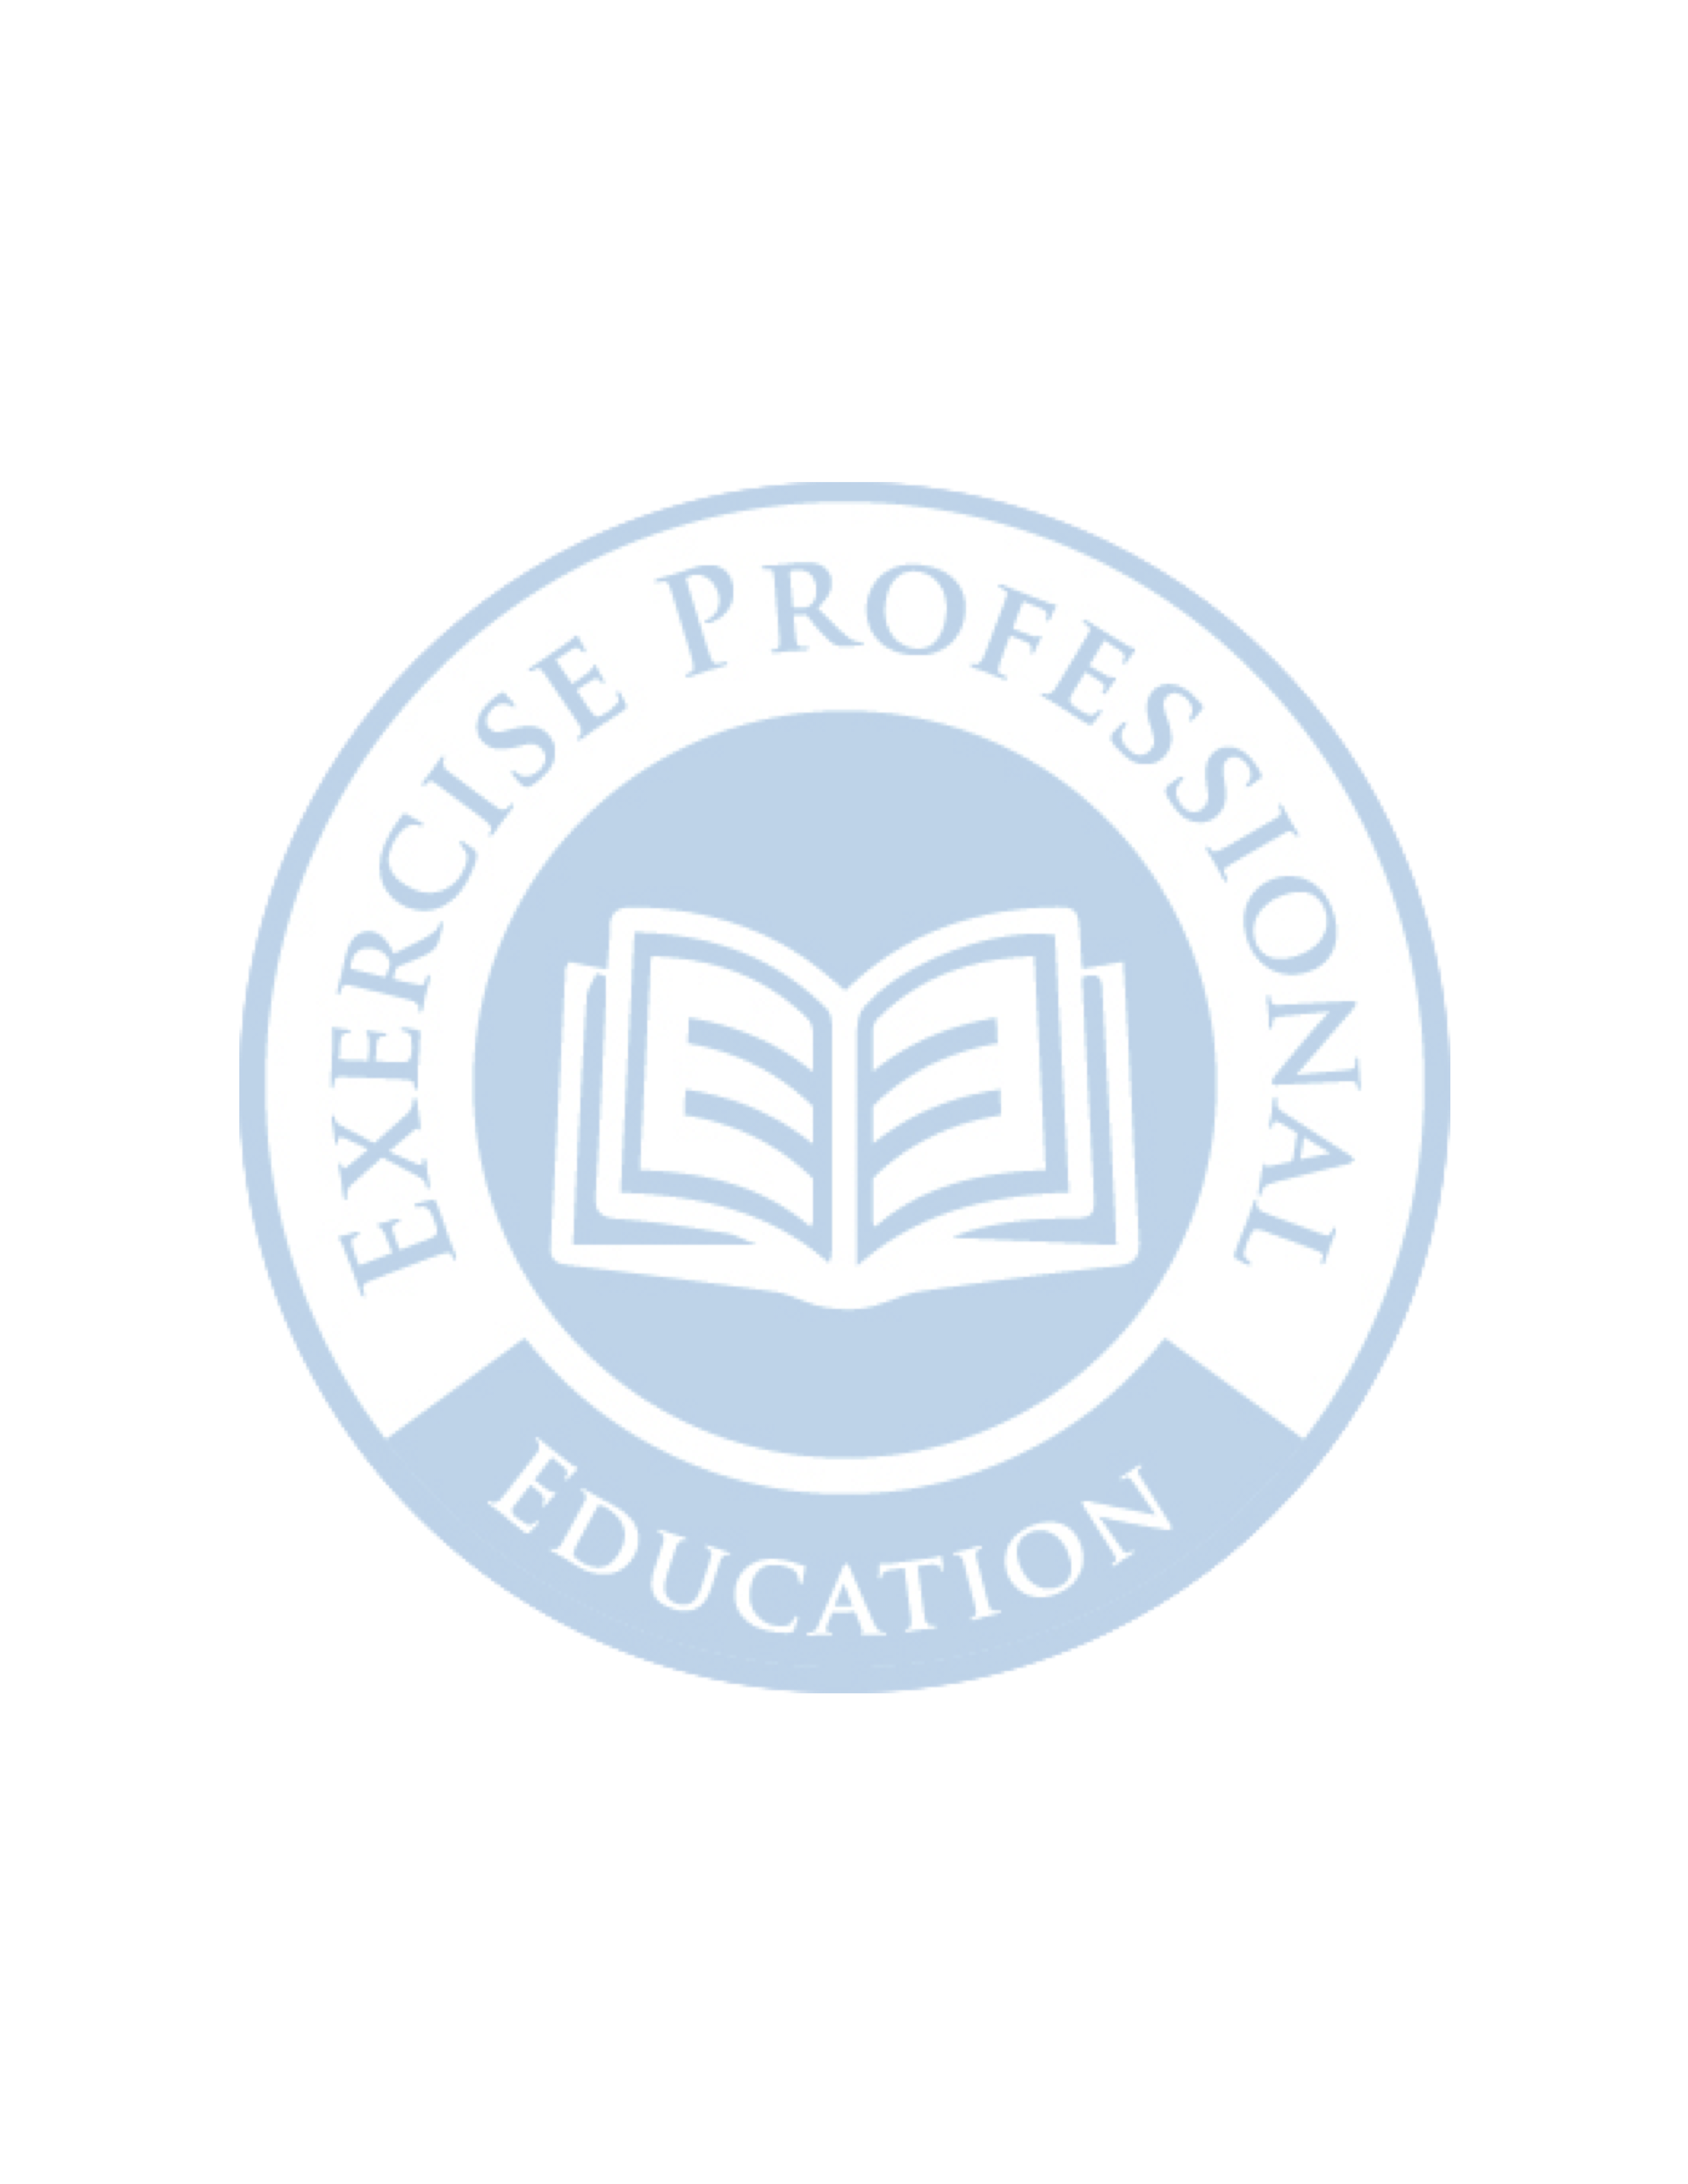 Exercise Professional Education